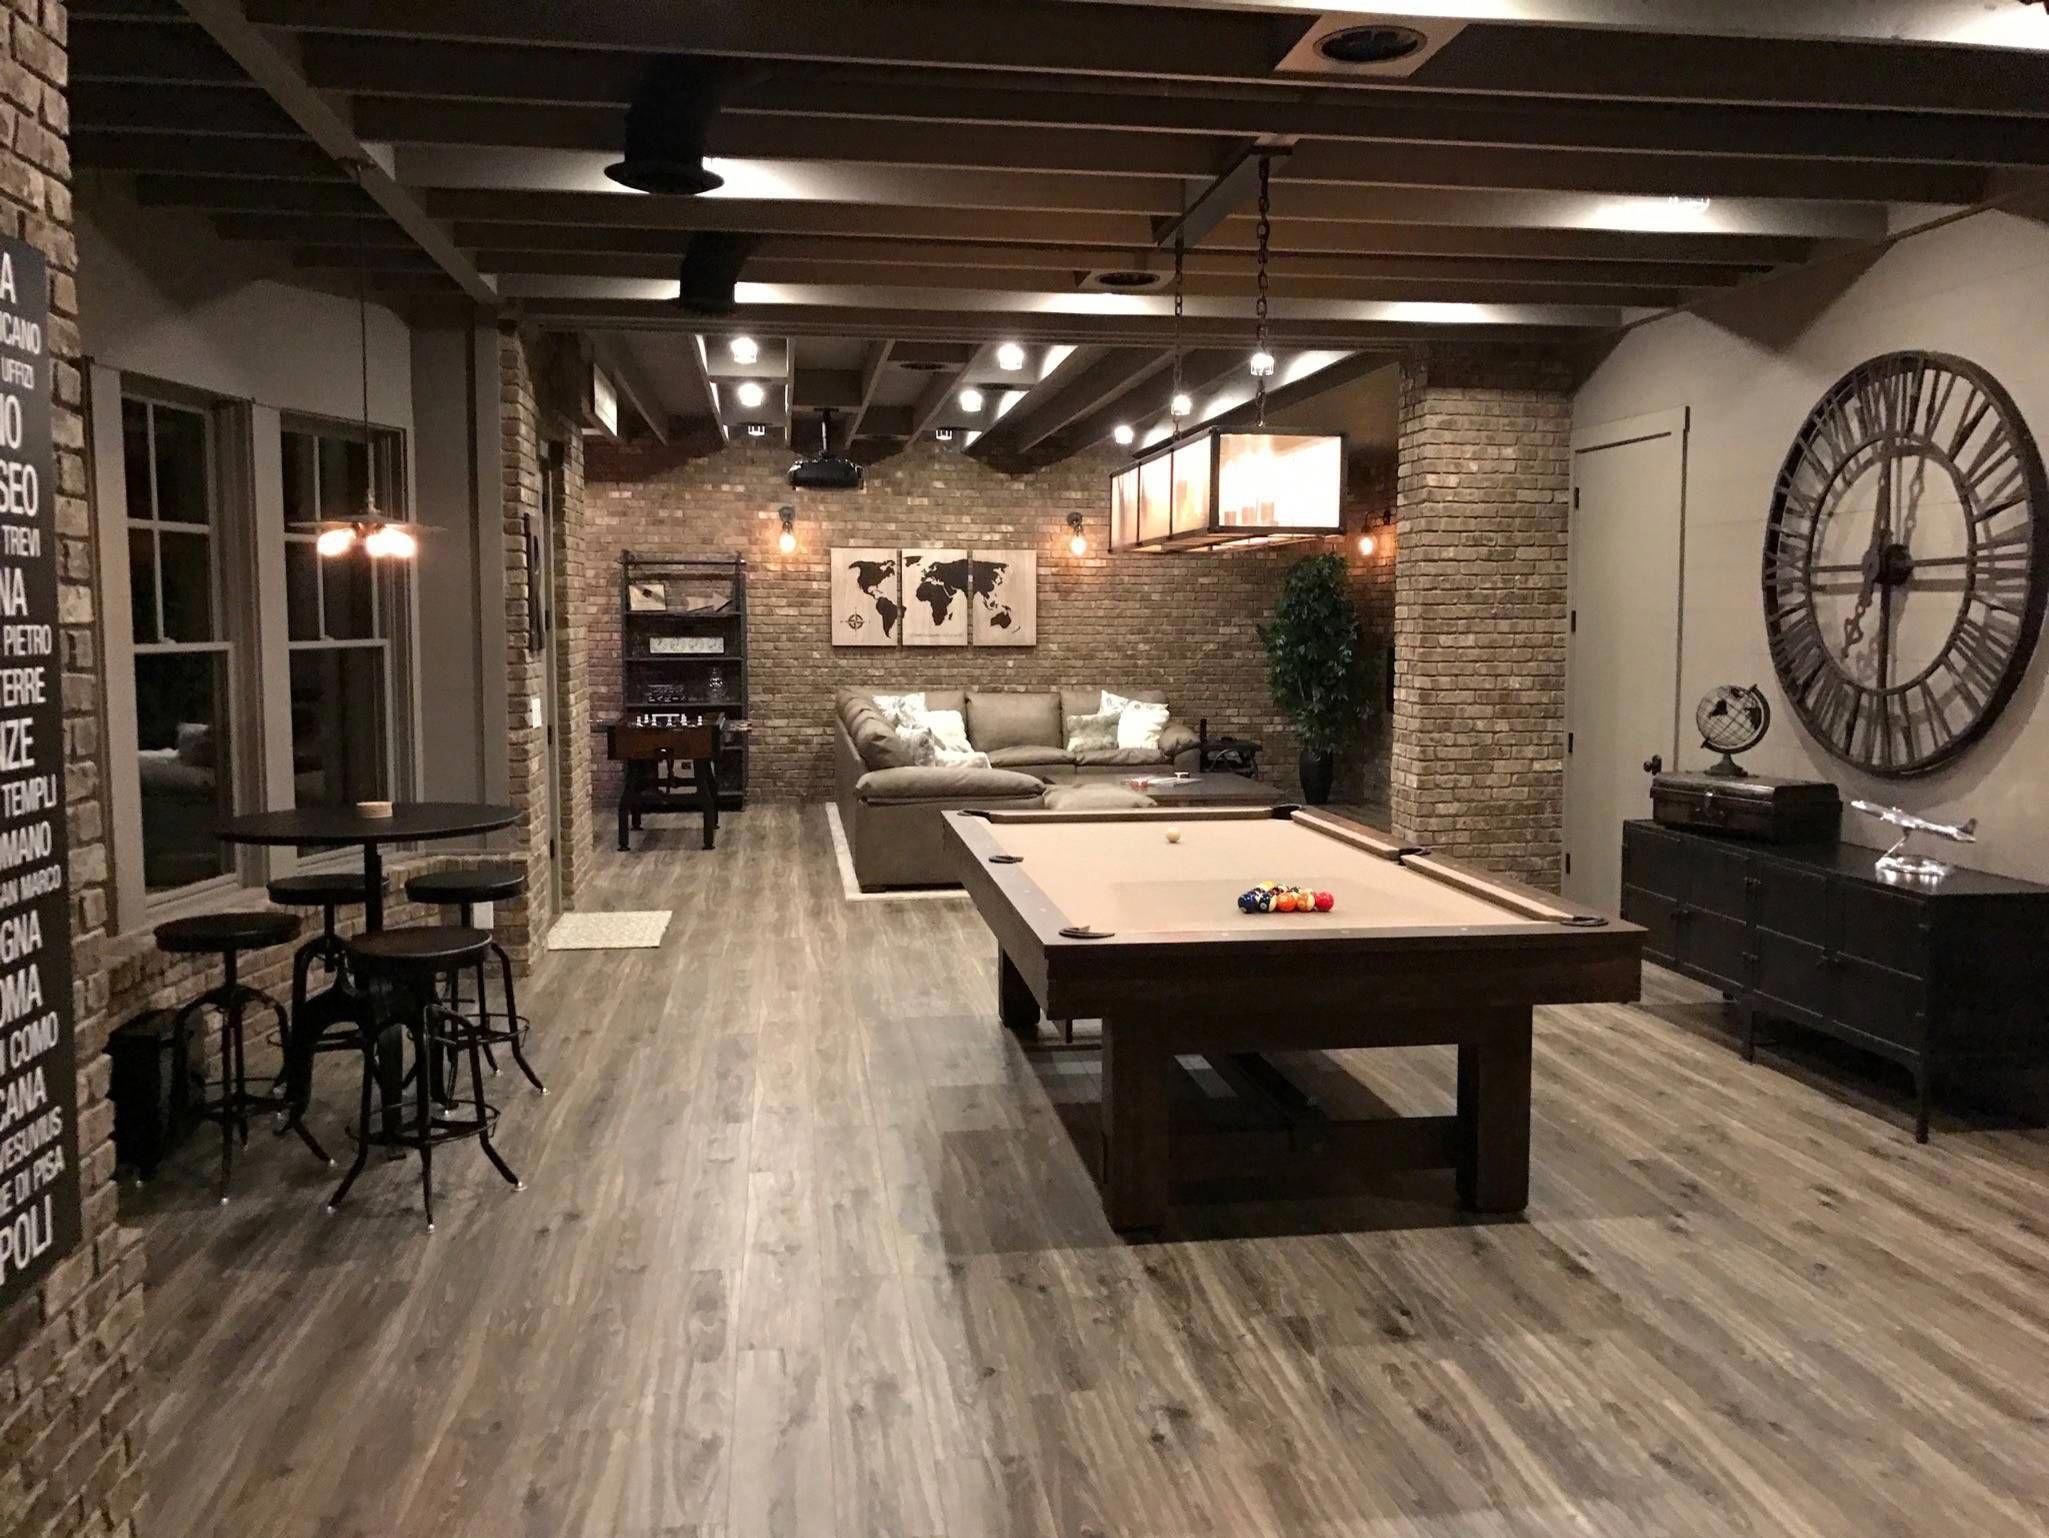 remodel basement,basement ideas,renovate basement,basement ...